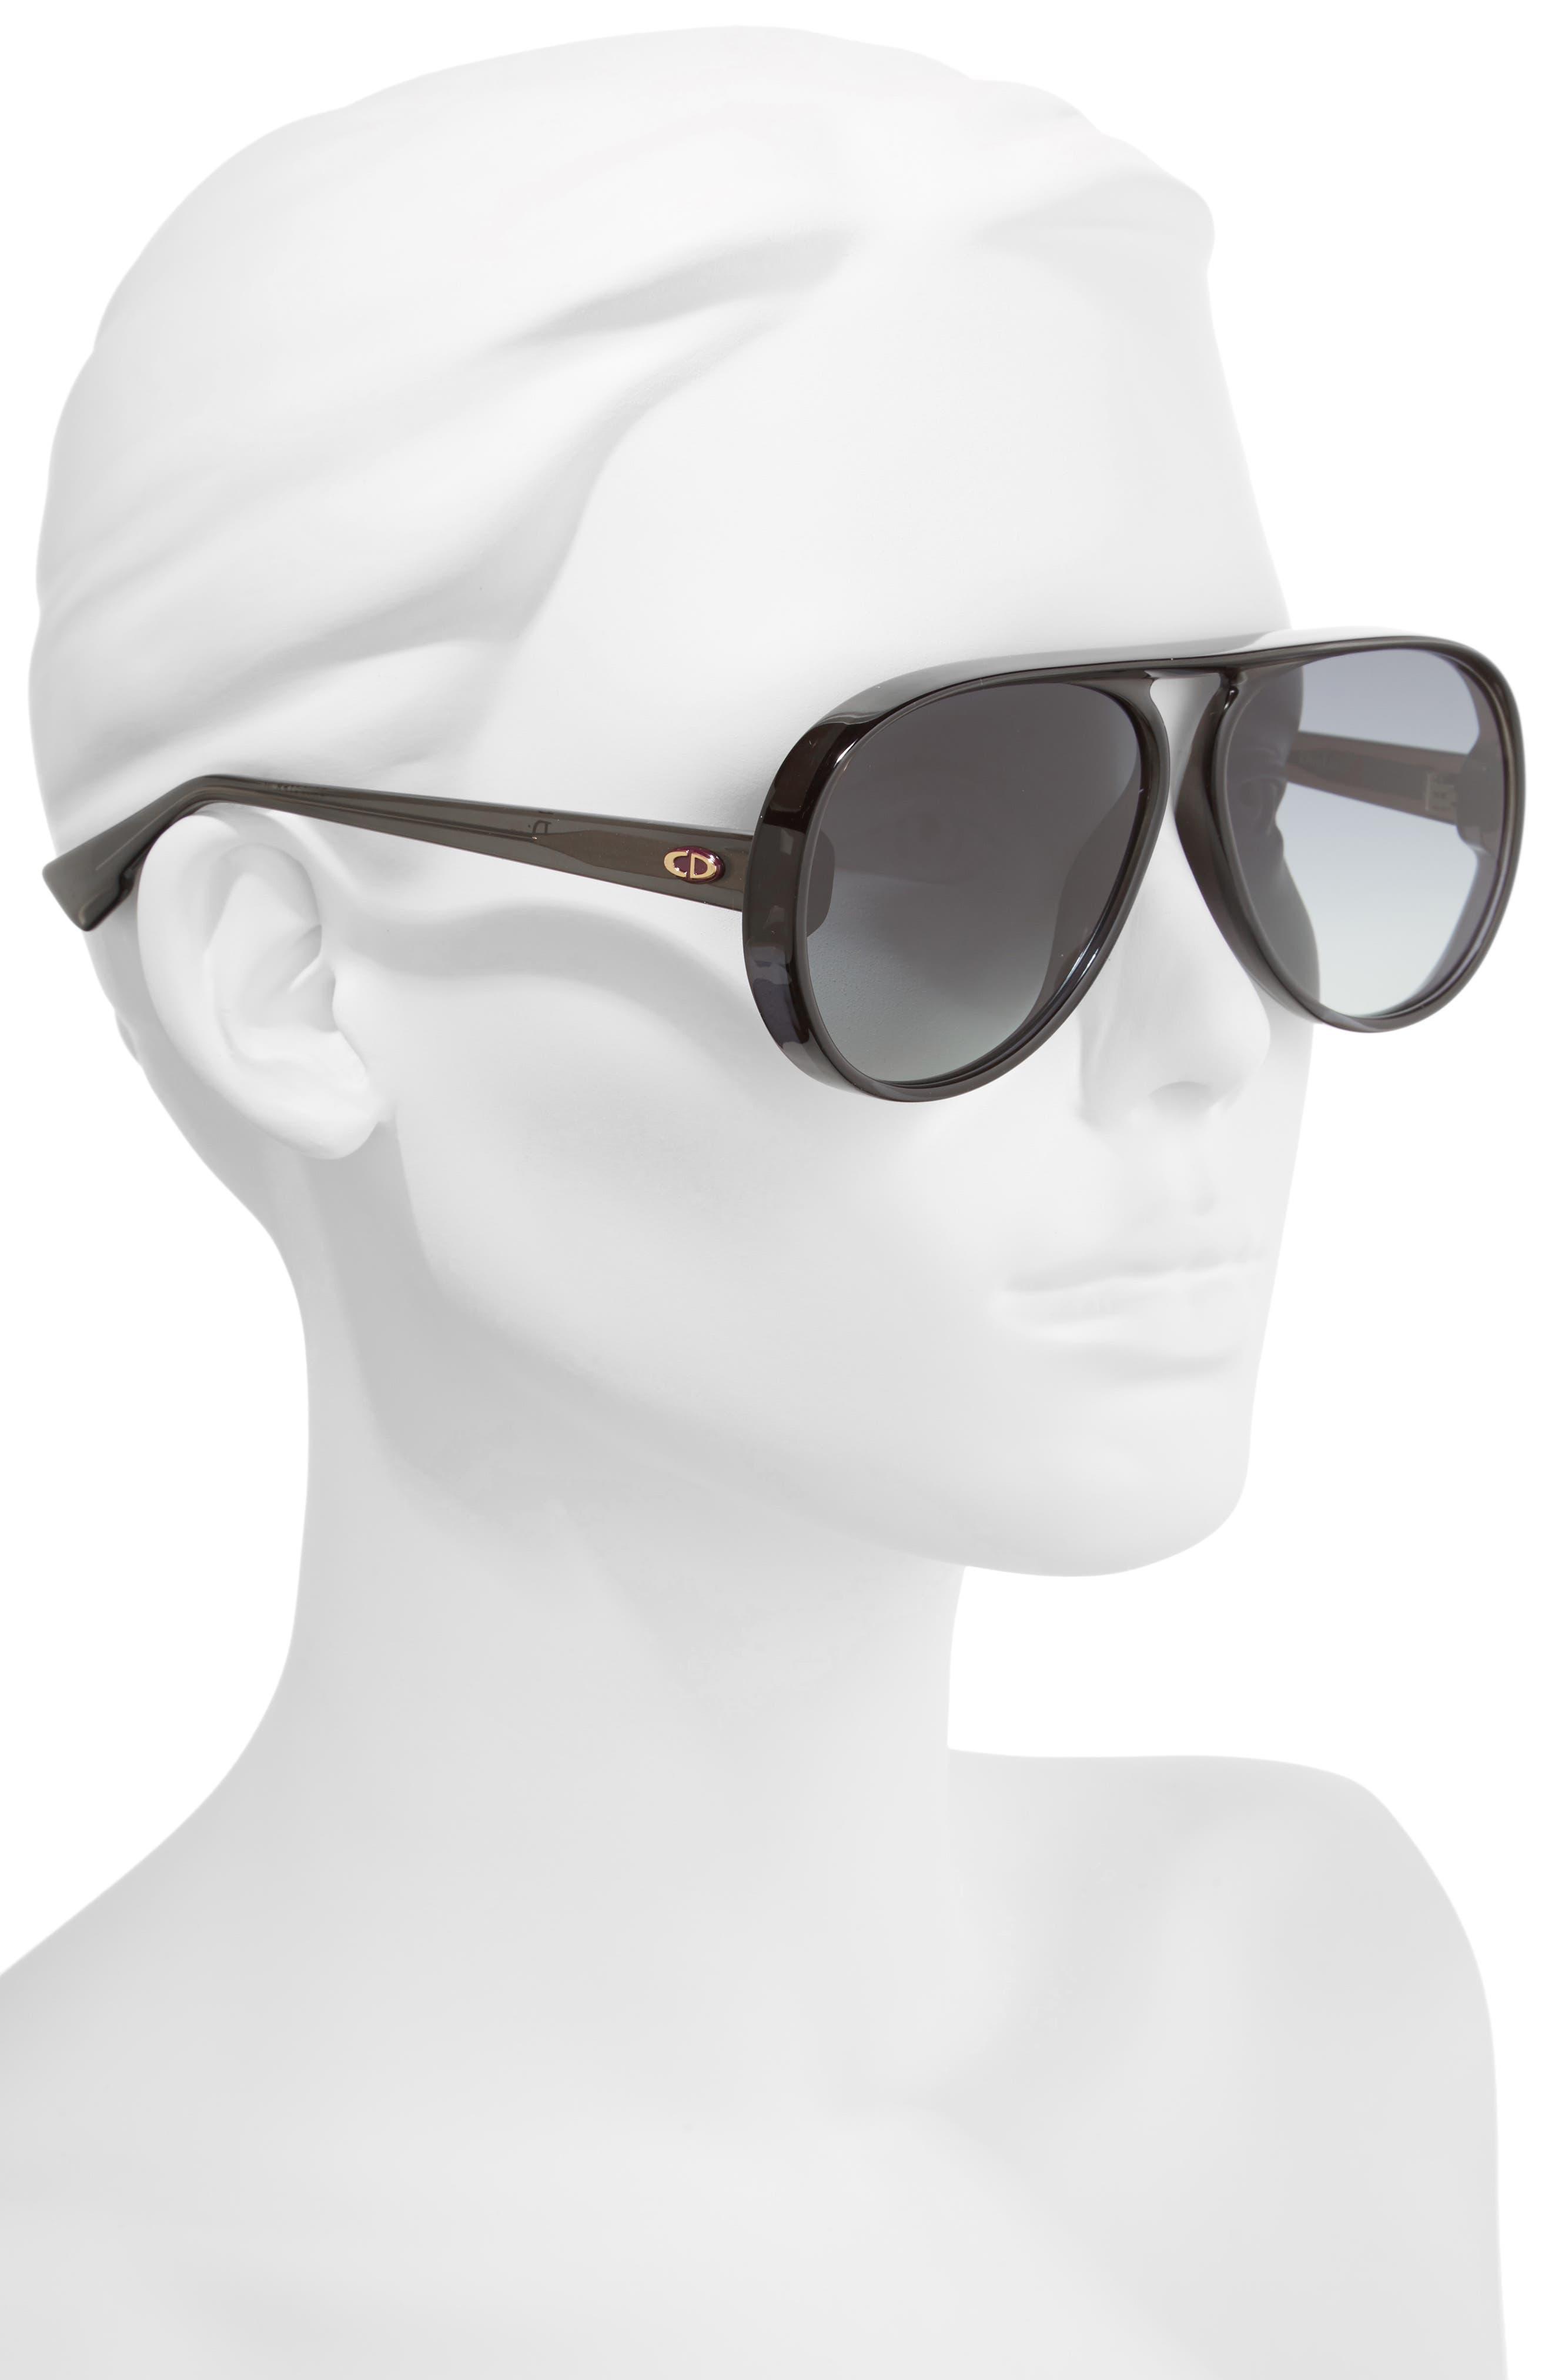 Lia 62mm Oversize Aviator Sunglasses,                             Alternate thumbnail 2, color,                             020